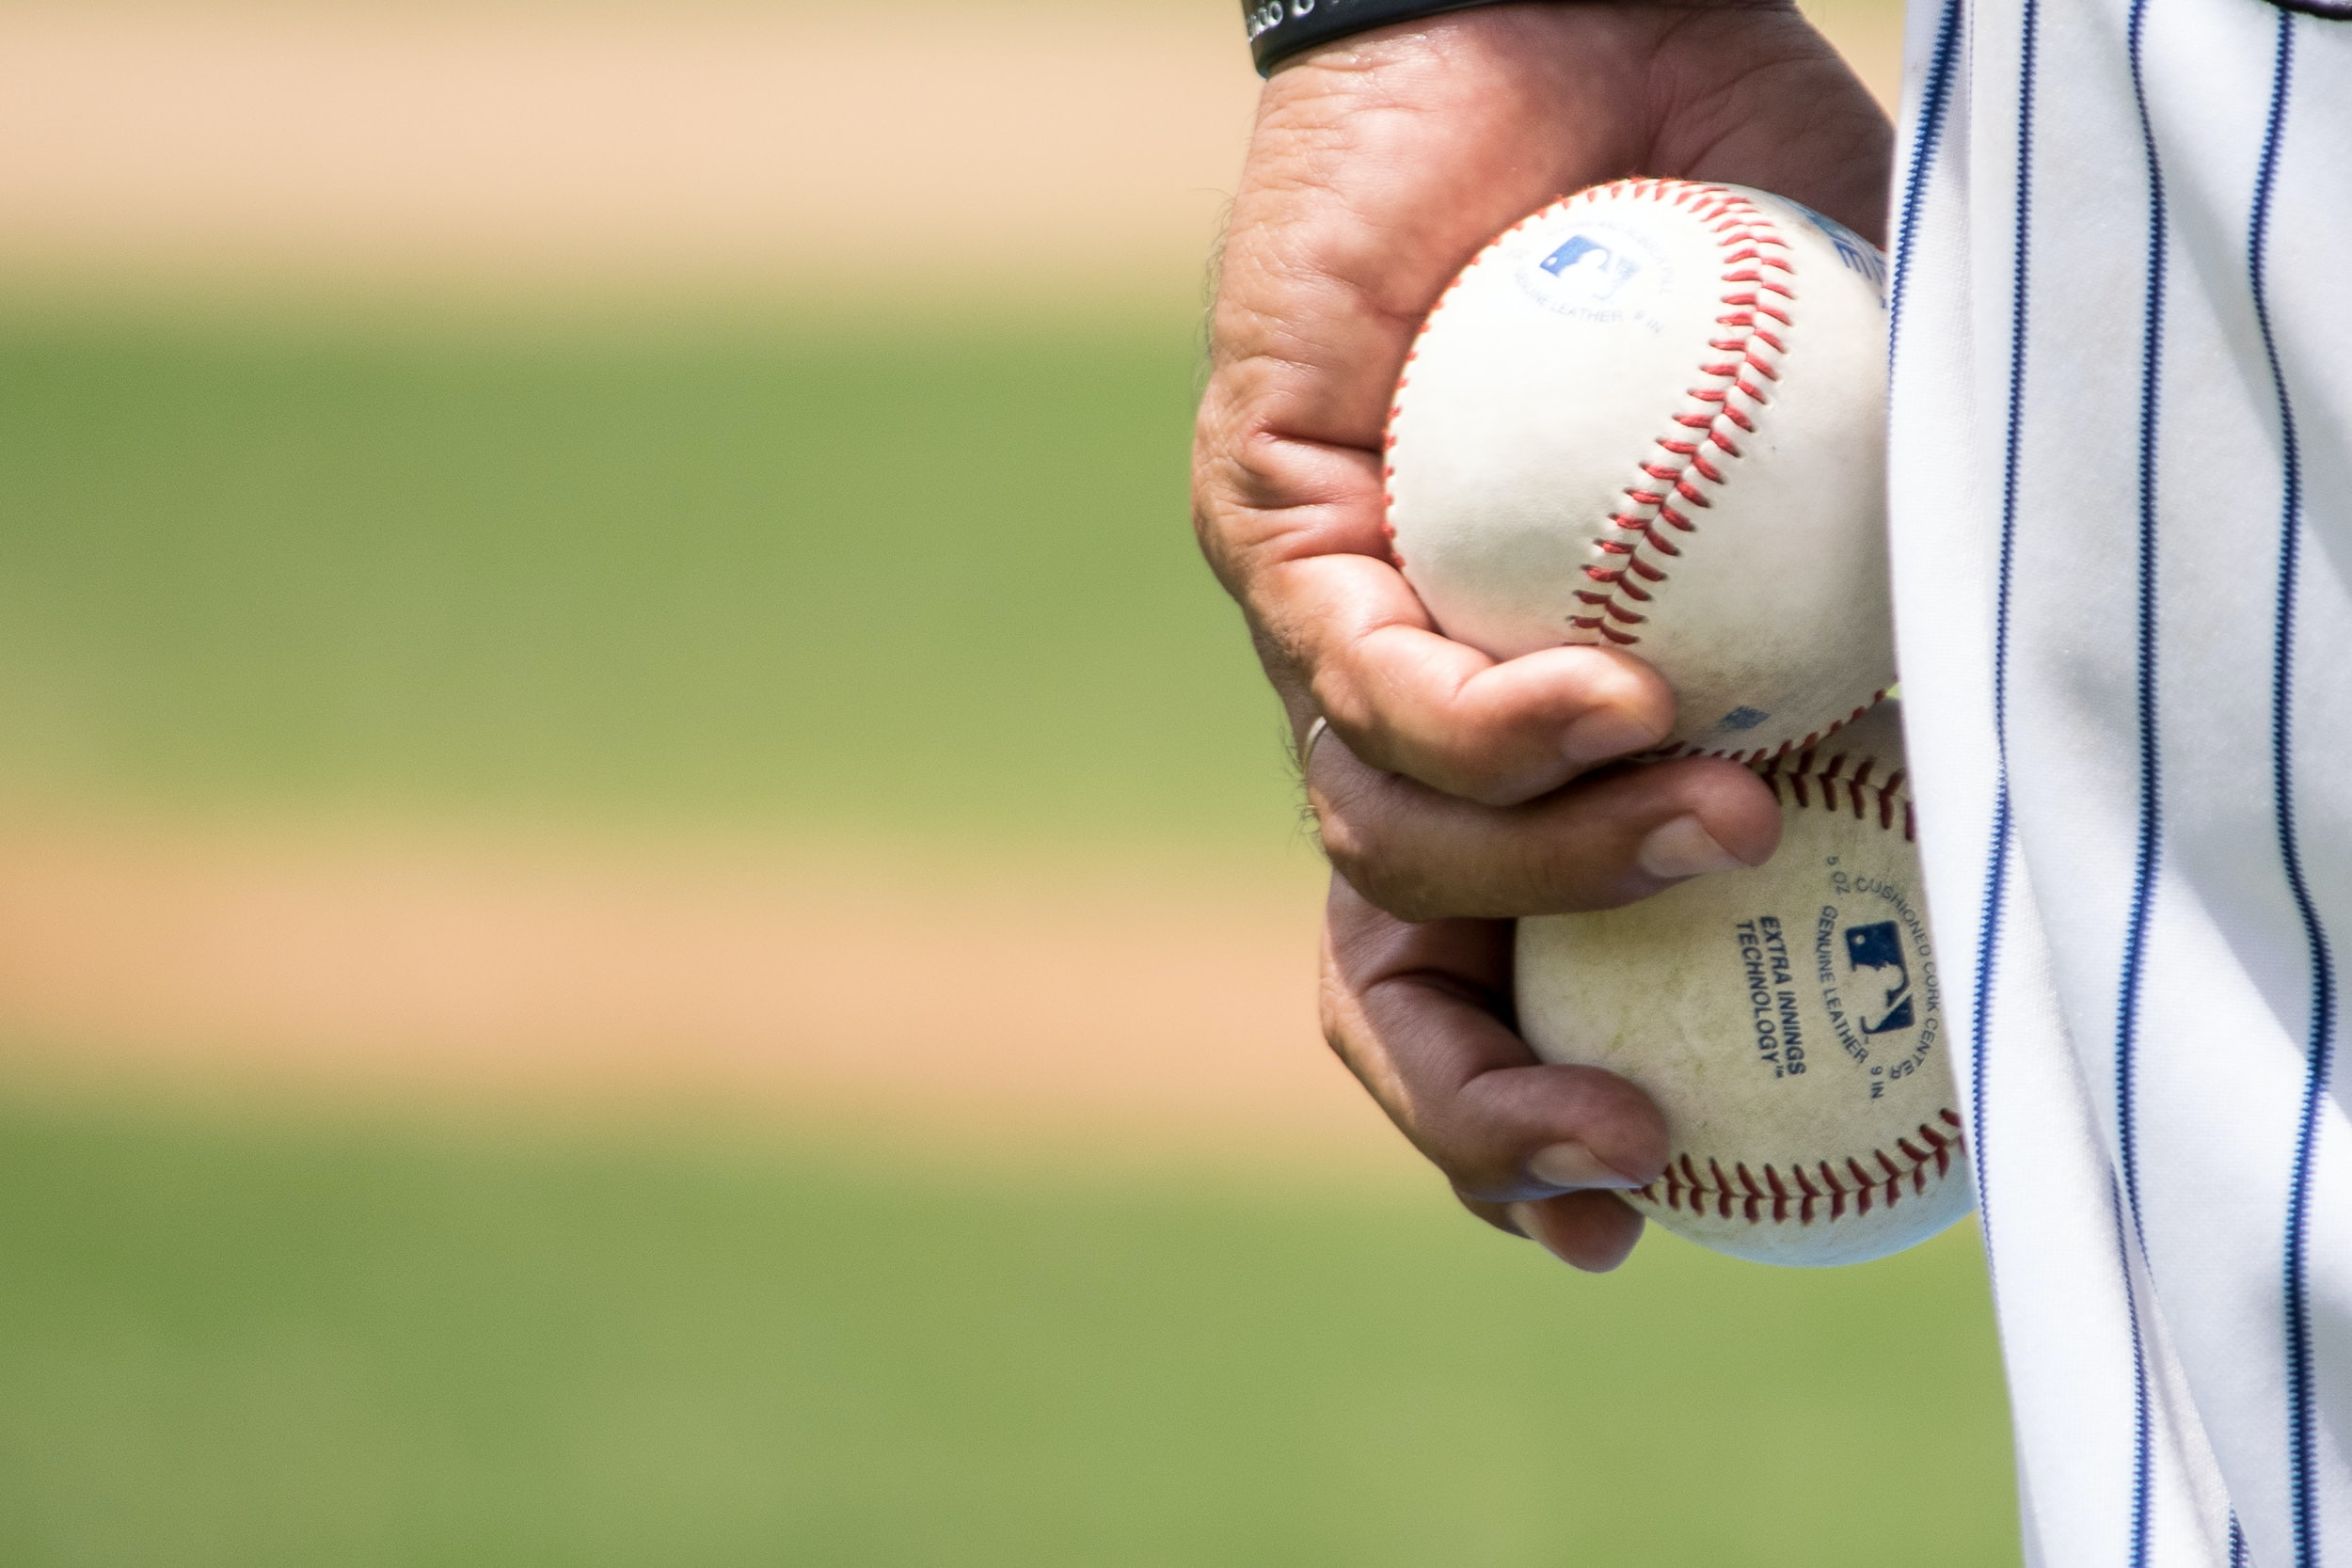 Person holding baseballs